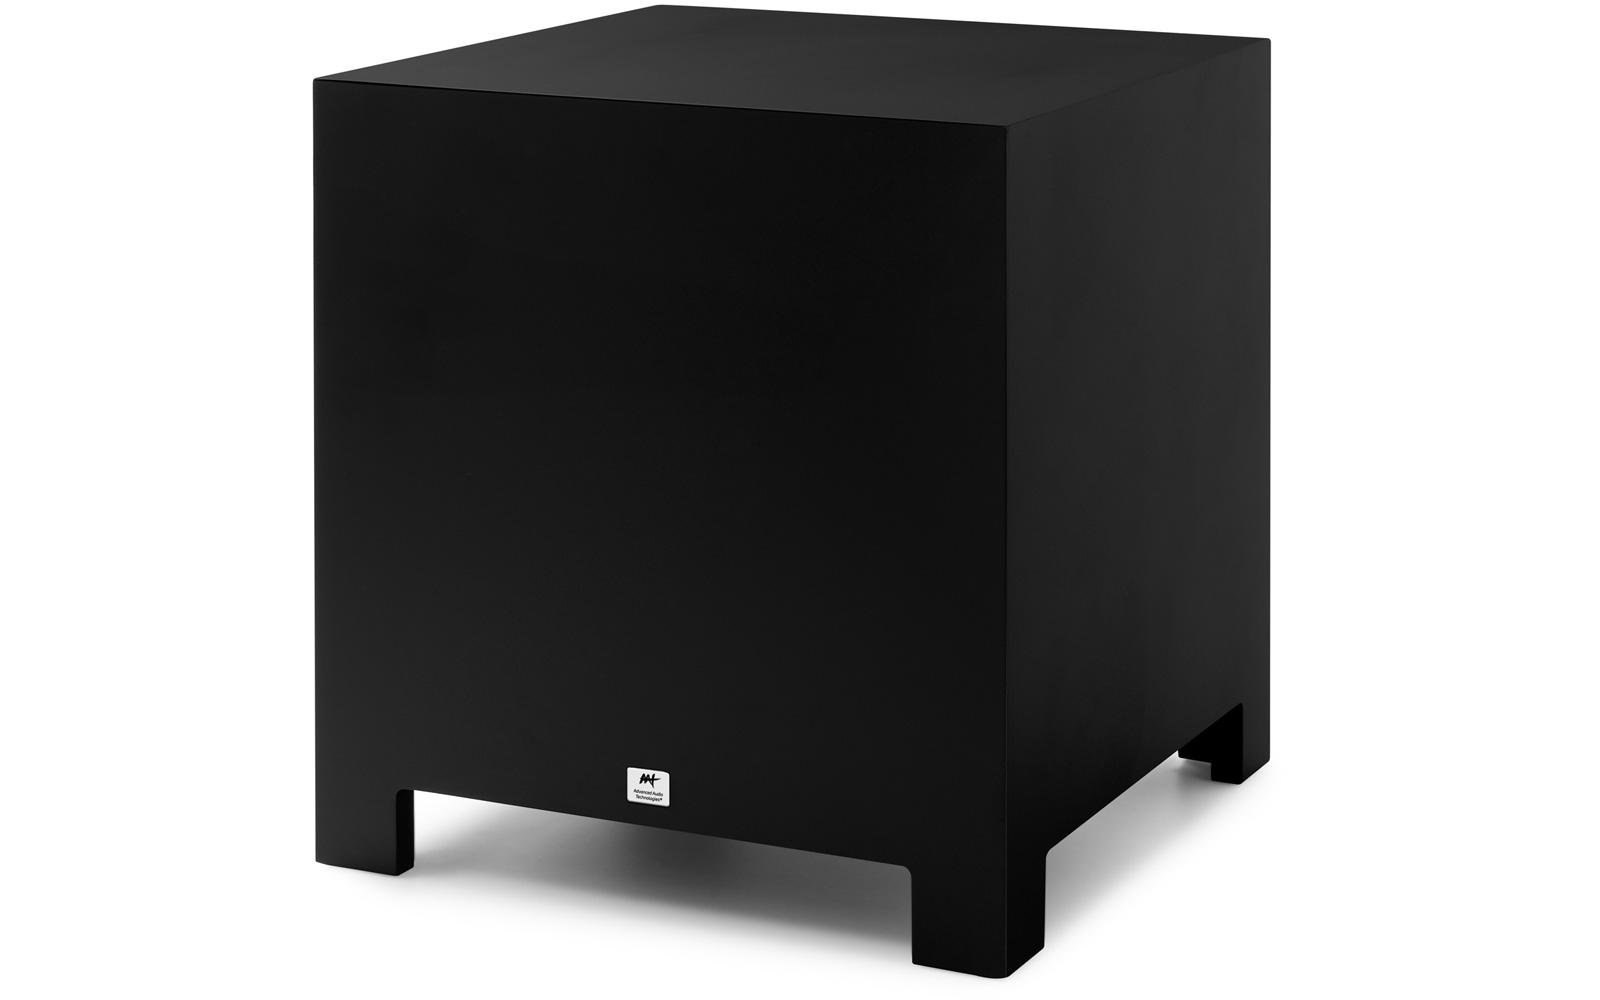 AAT Cube Rakt 10 - Subwoofer 10 pol. 500W rms - Preto  - Audio Video & cia